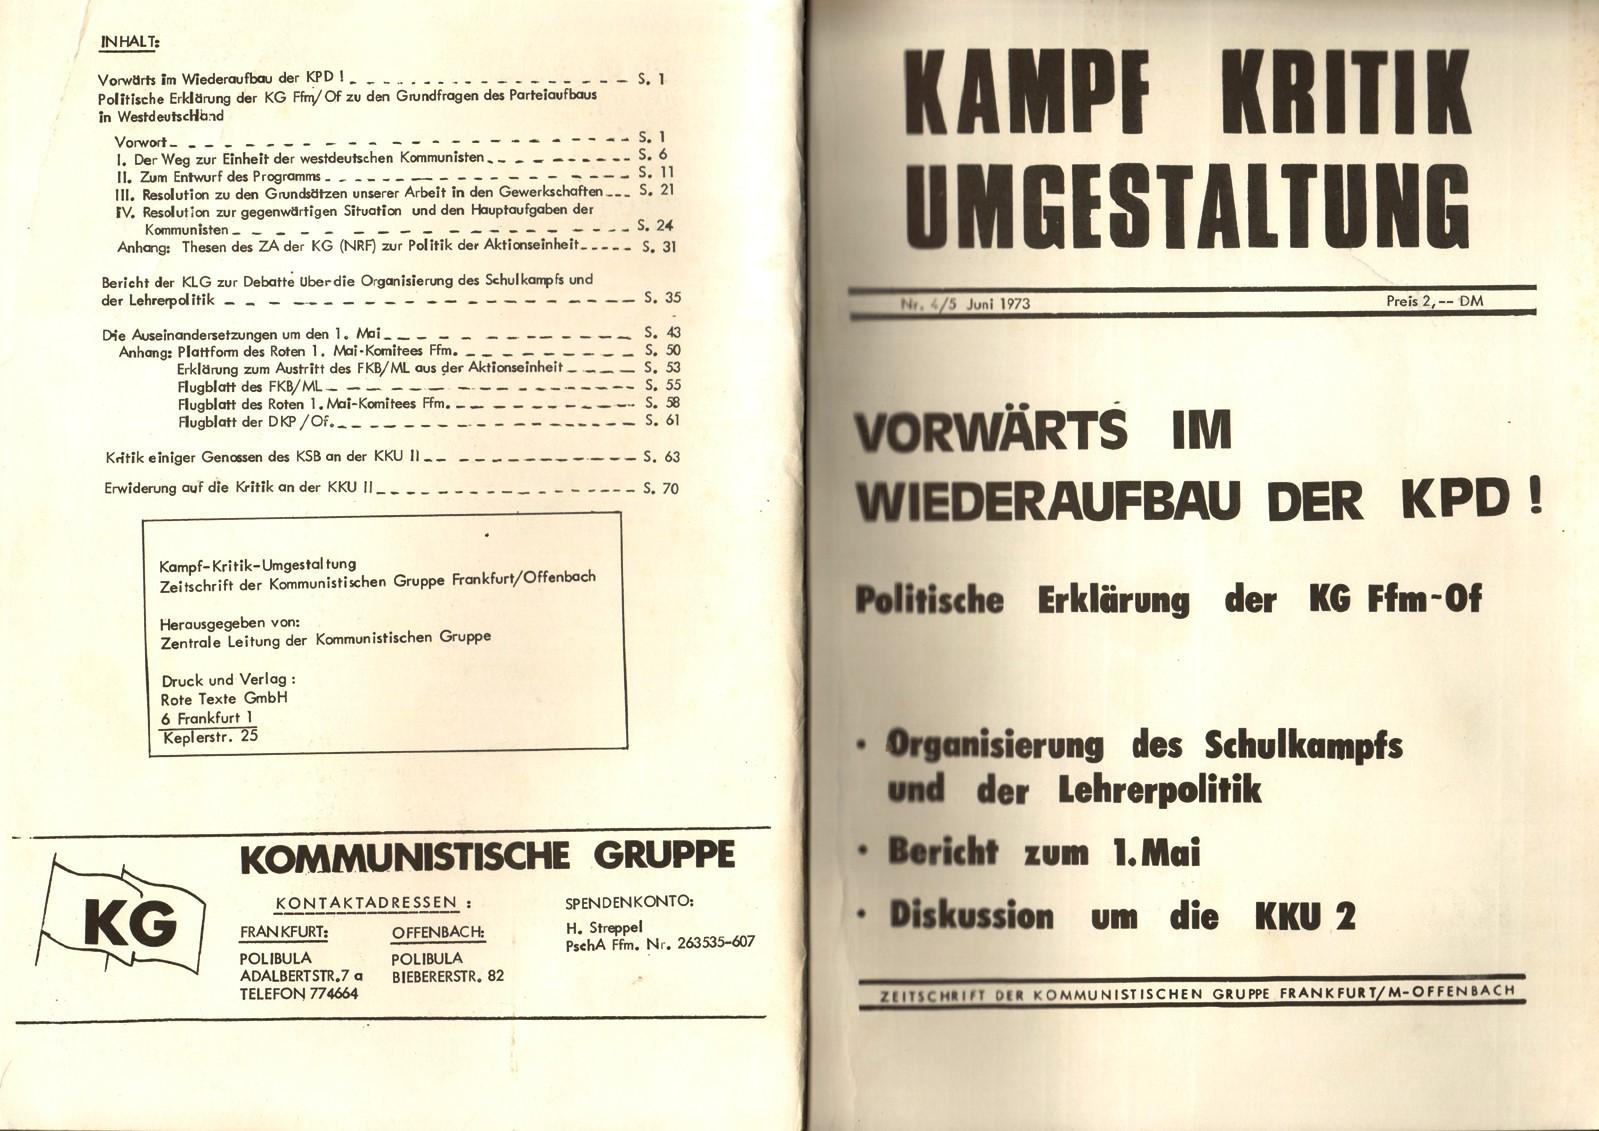 Frankfurt_Offenbach_KG_Kampf_Kritik_Umgestaltung_1973_04_05_01